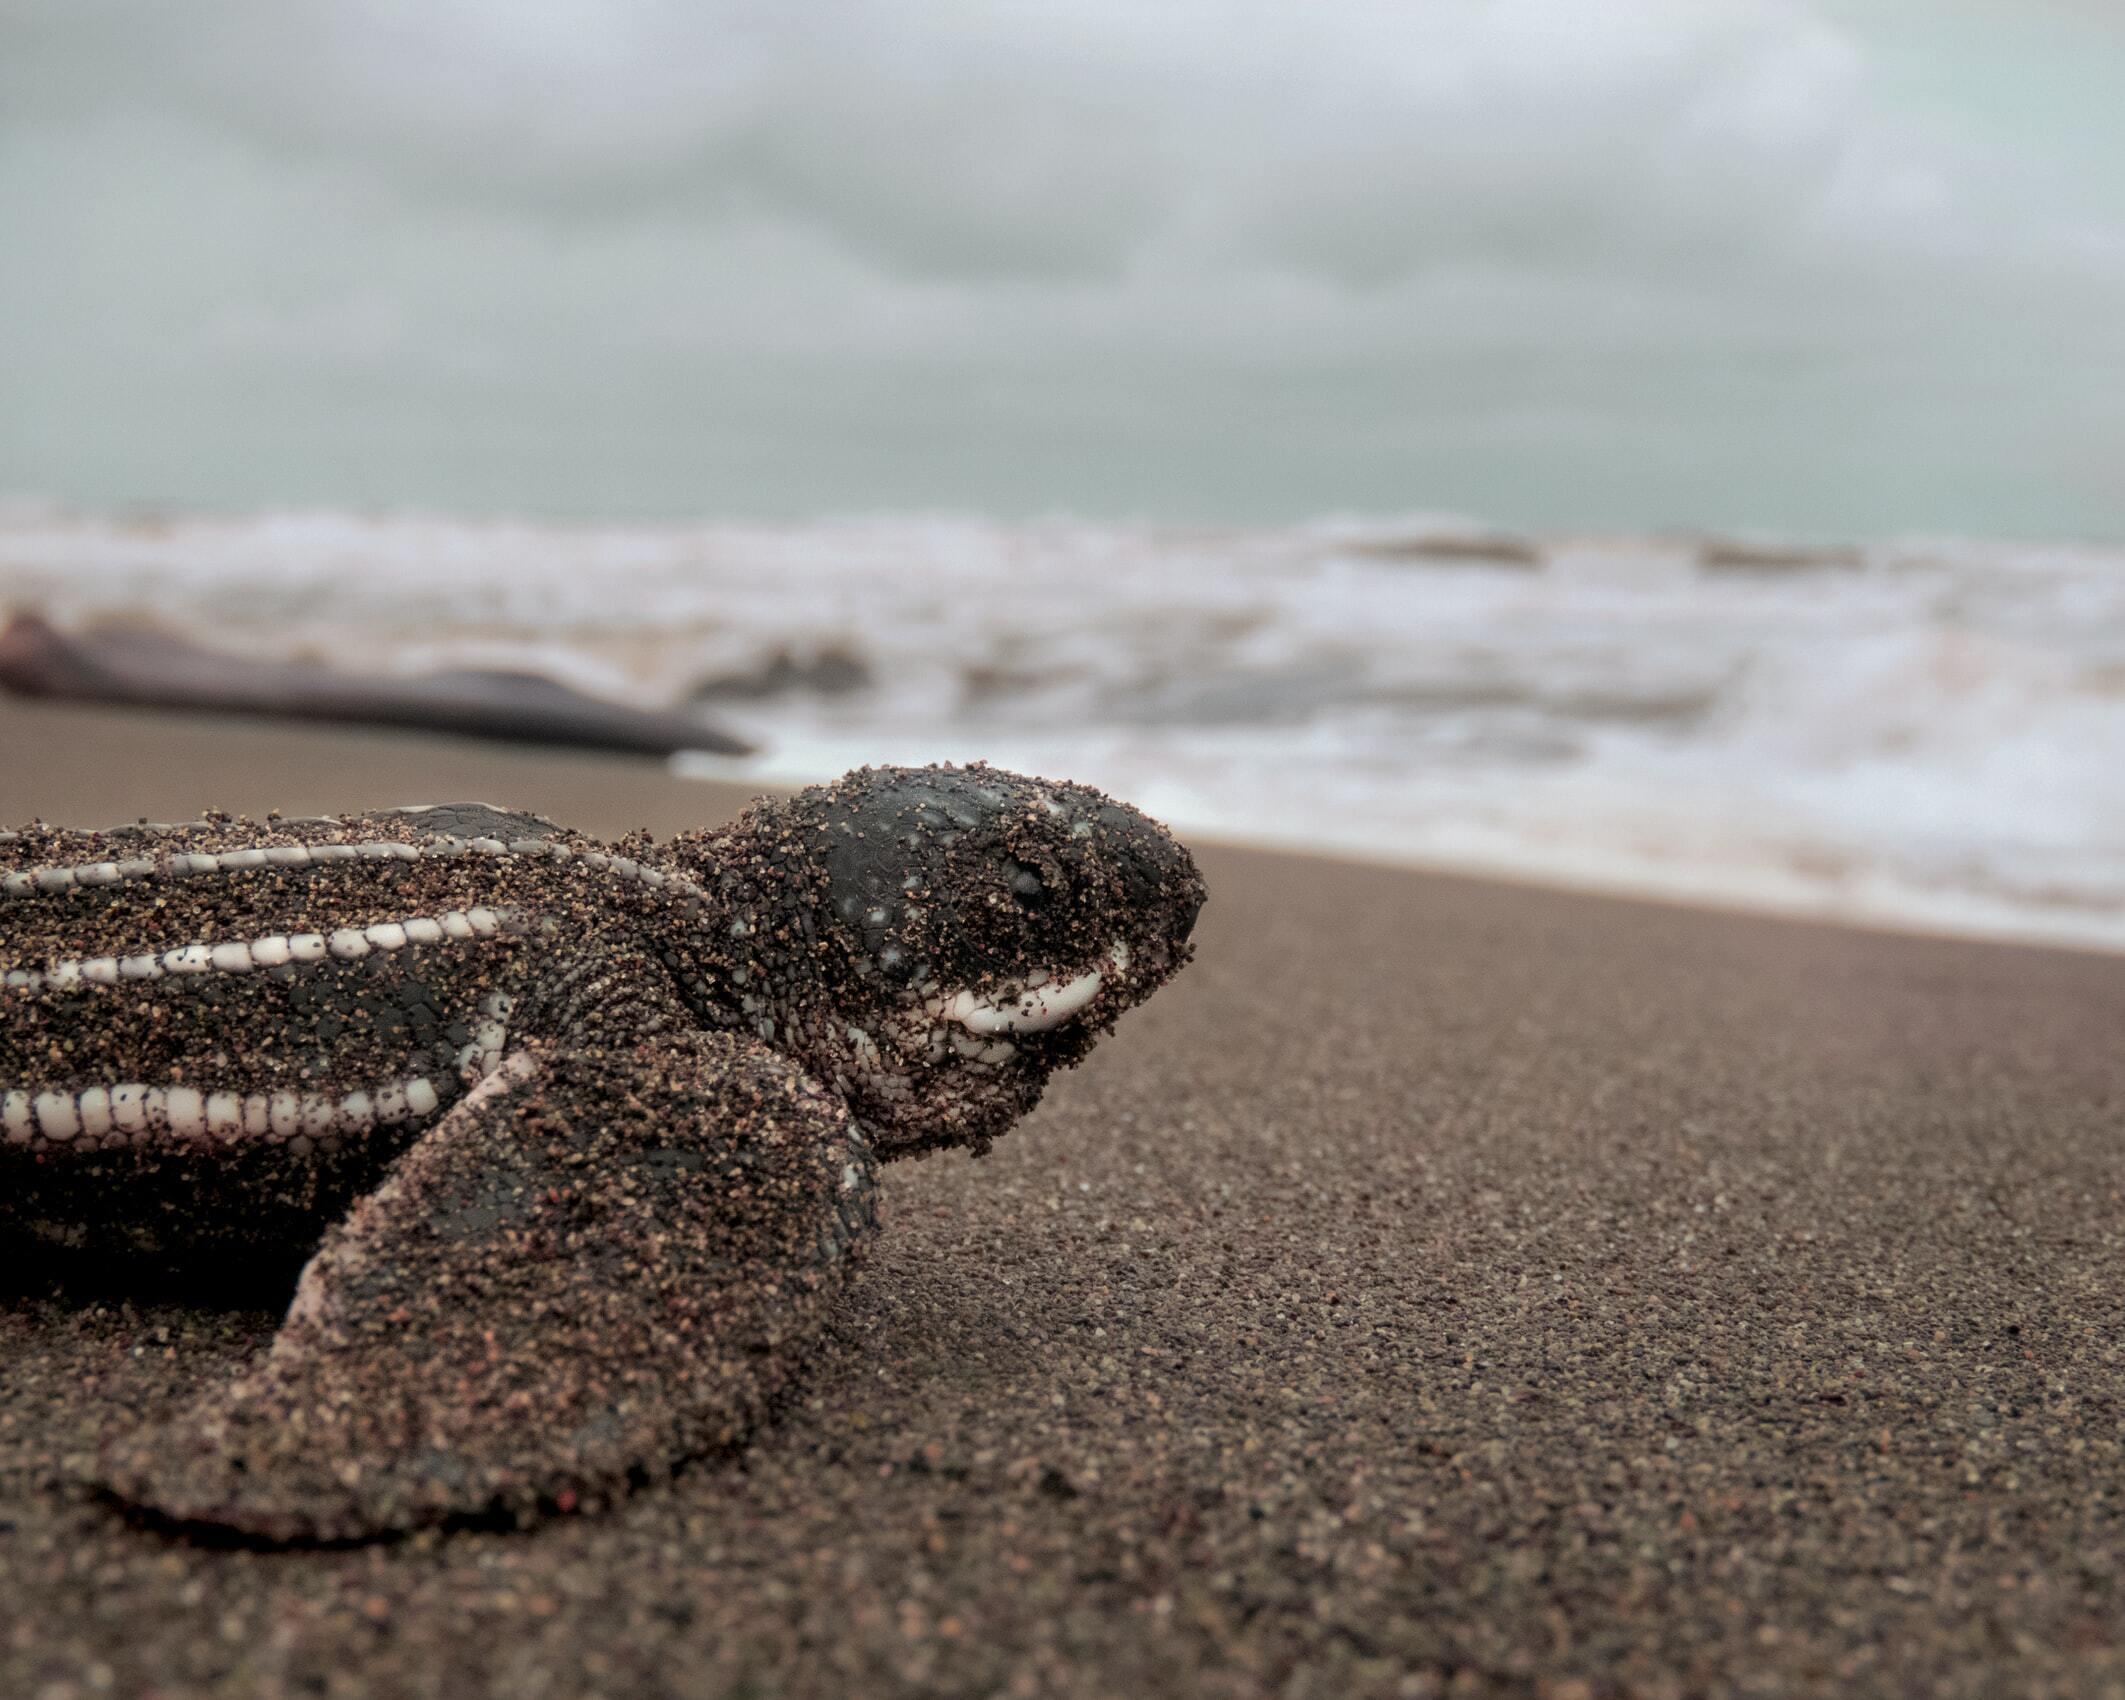 Leatherback Turtles VWFS